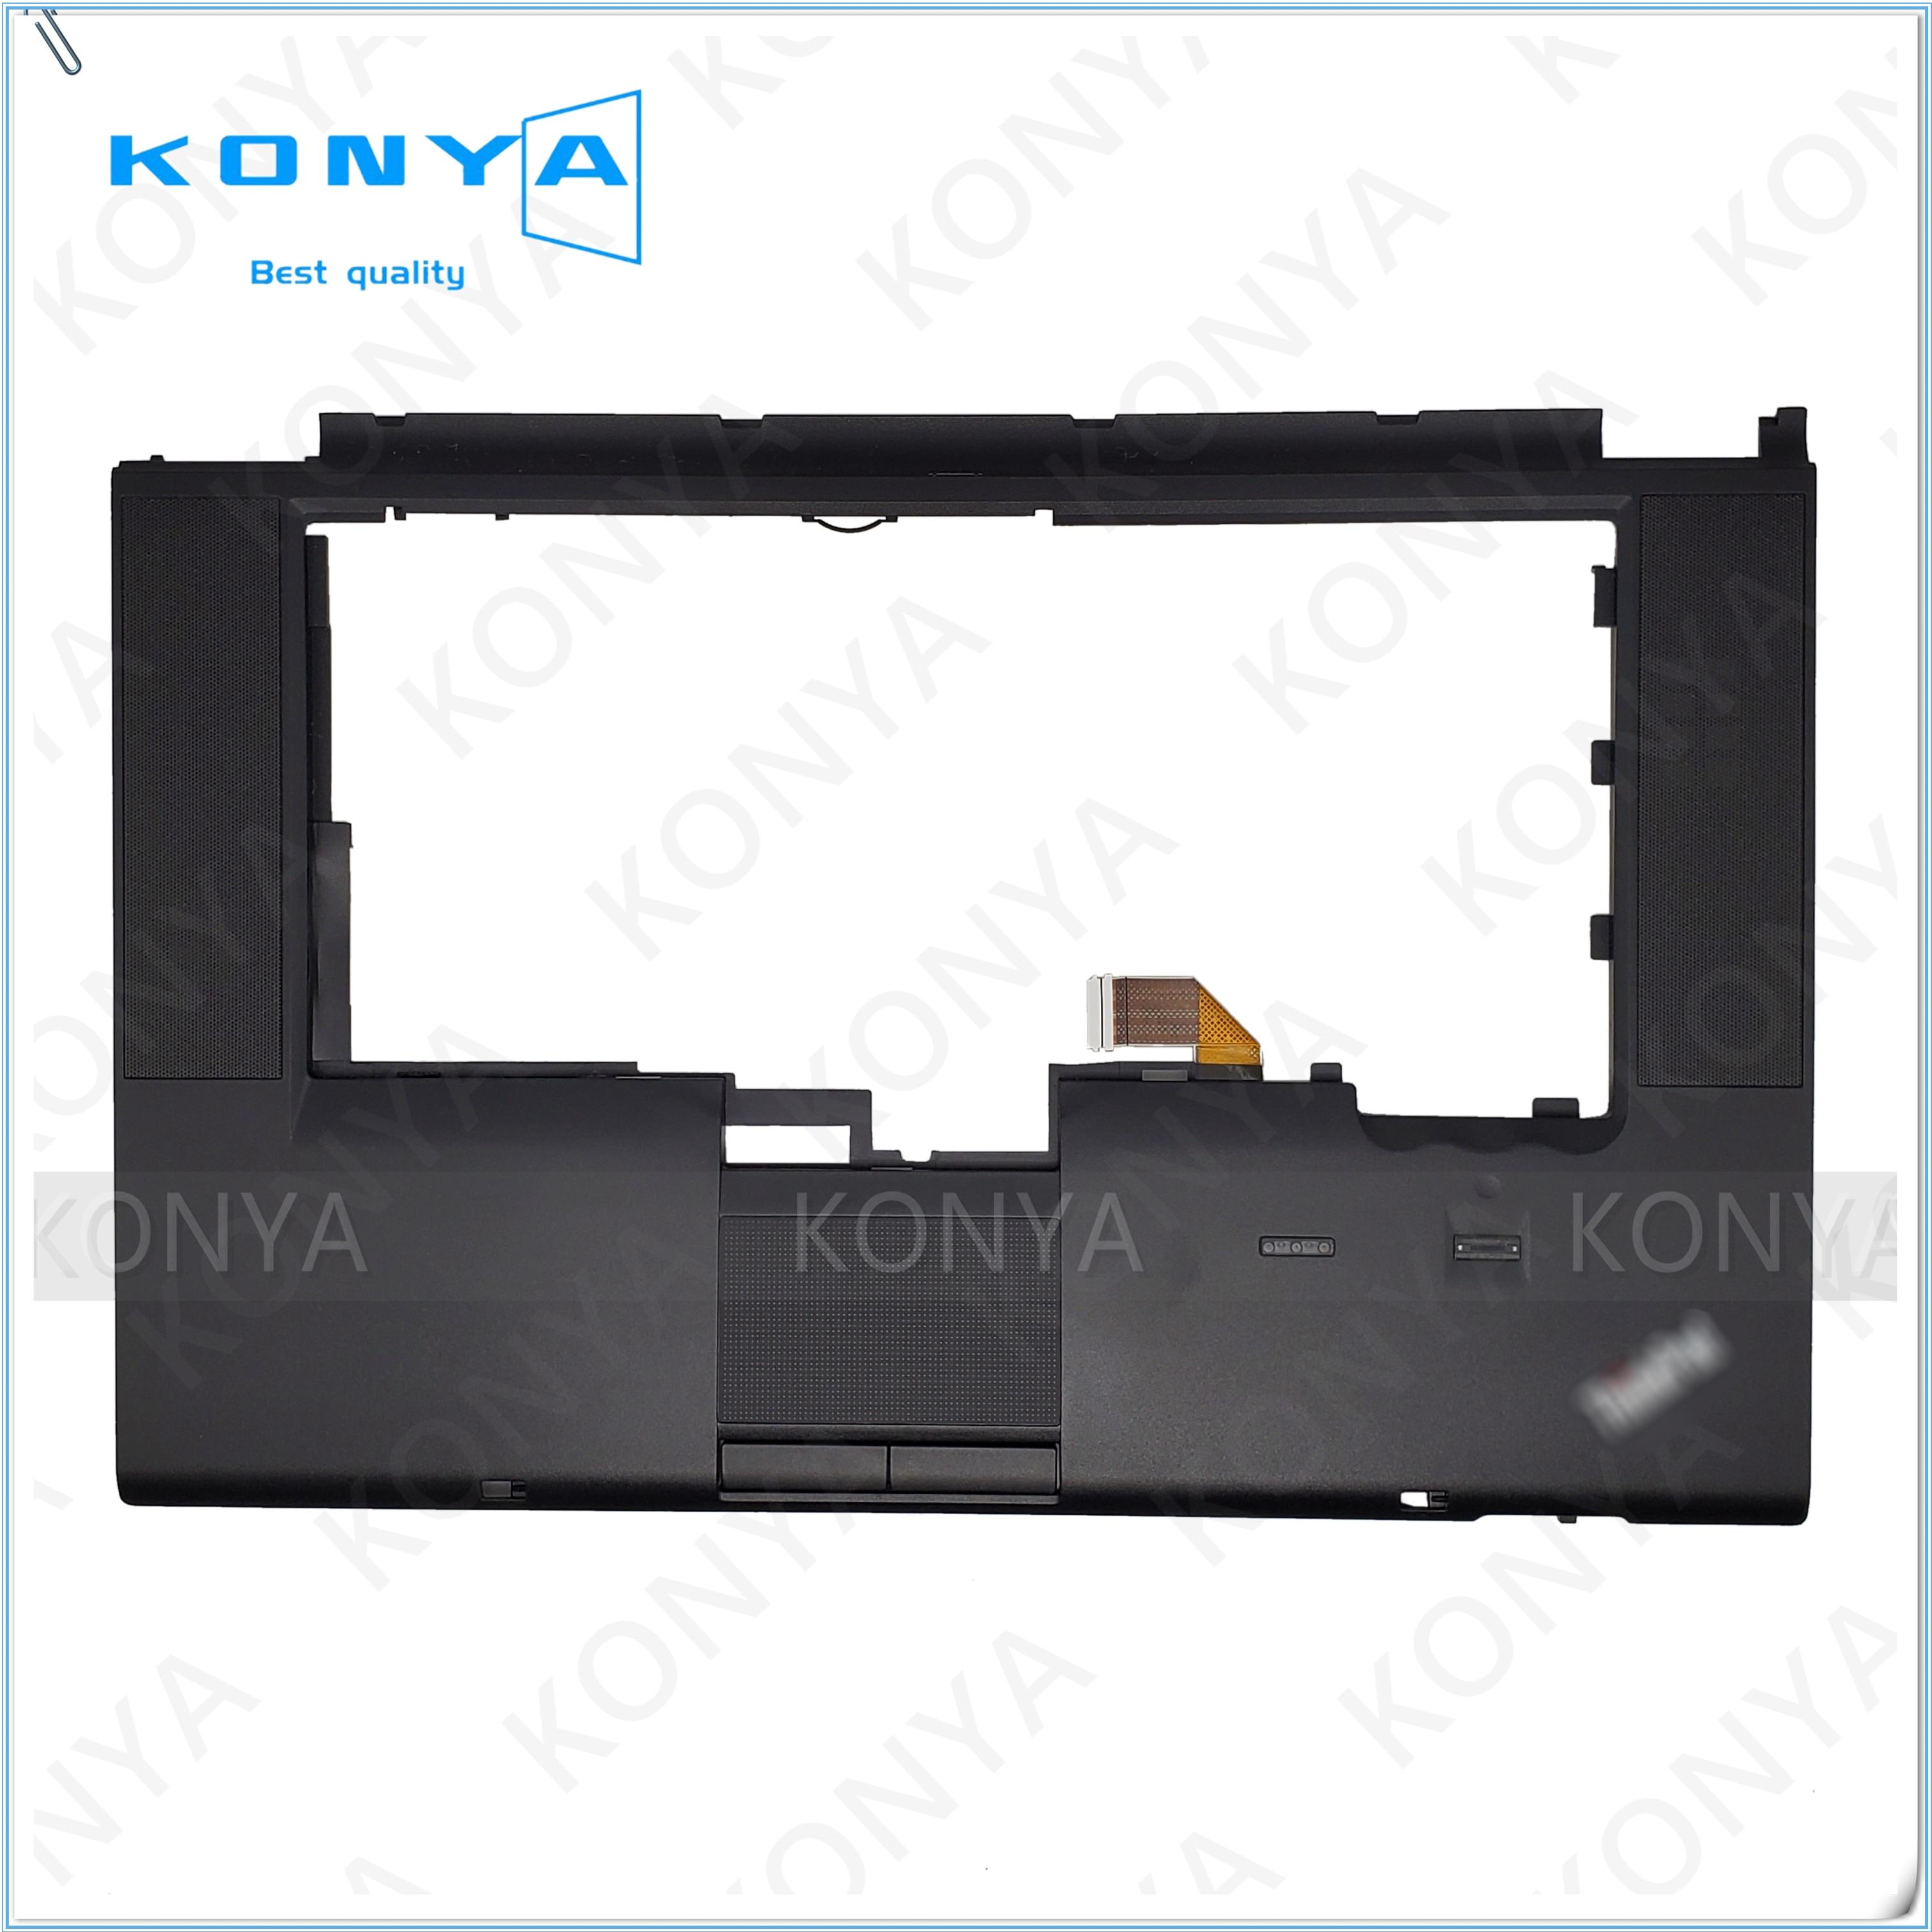 Neue Original laptop Für Lenovo ThinkPad T520 T520I W520 W520I Palmrest Touchpad Abdeckung Fall 04X3735 04X3738